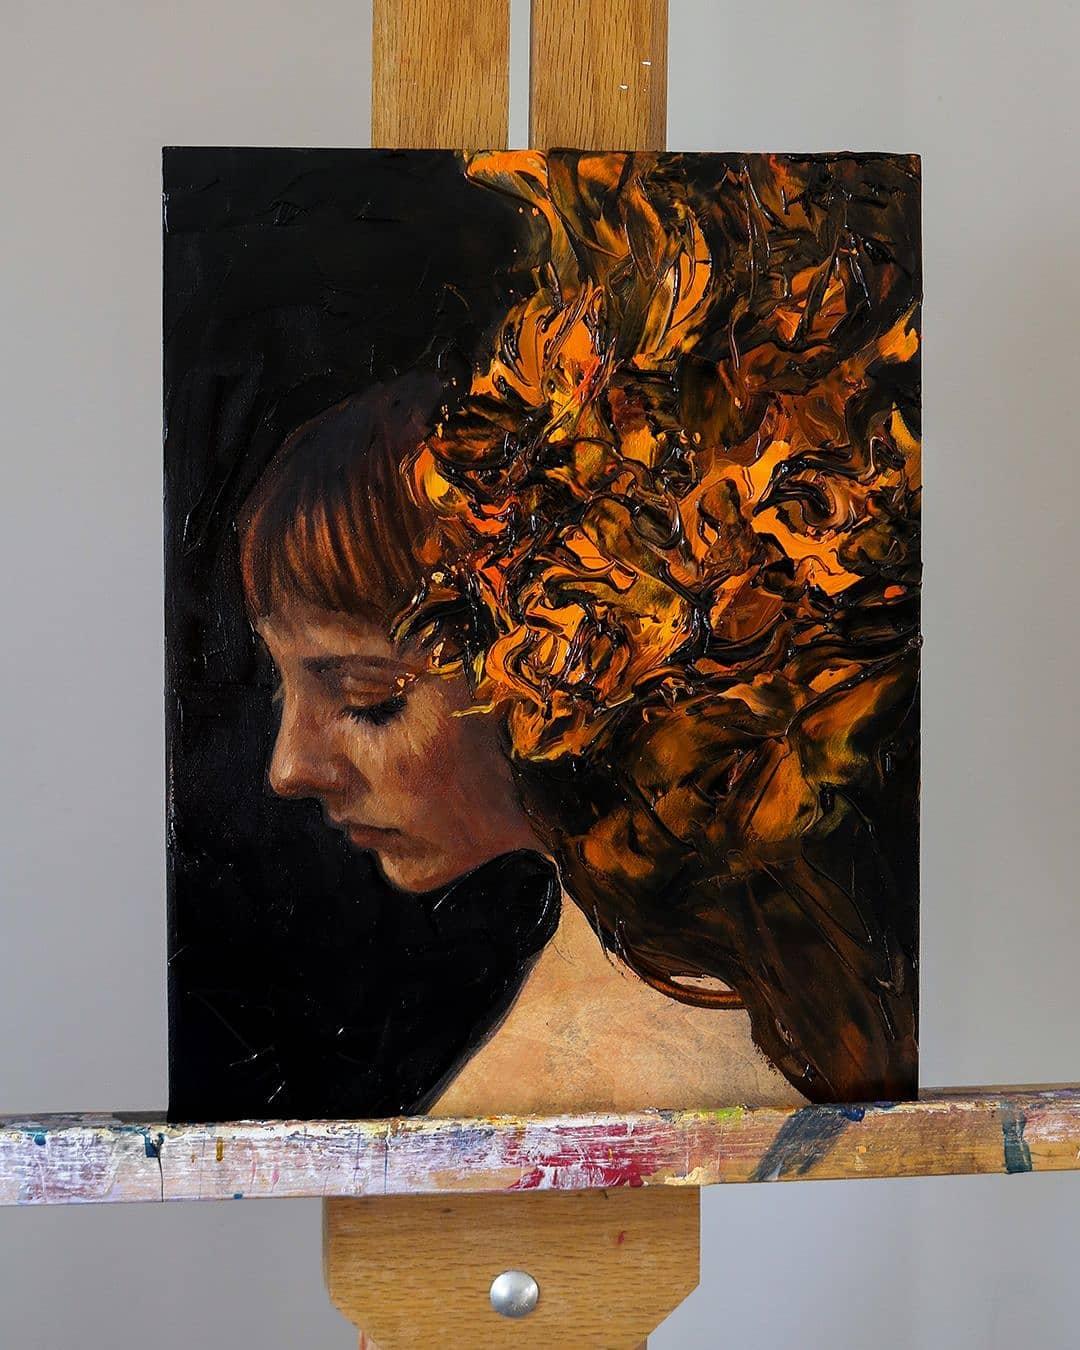 Girl Set Ablaze -Haily South.jpg